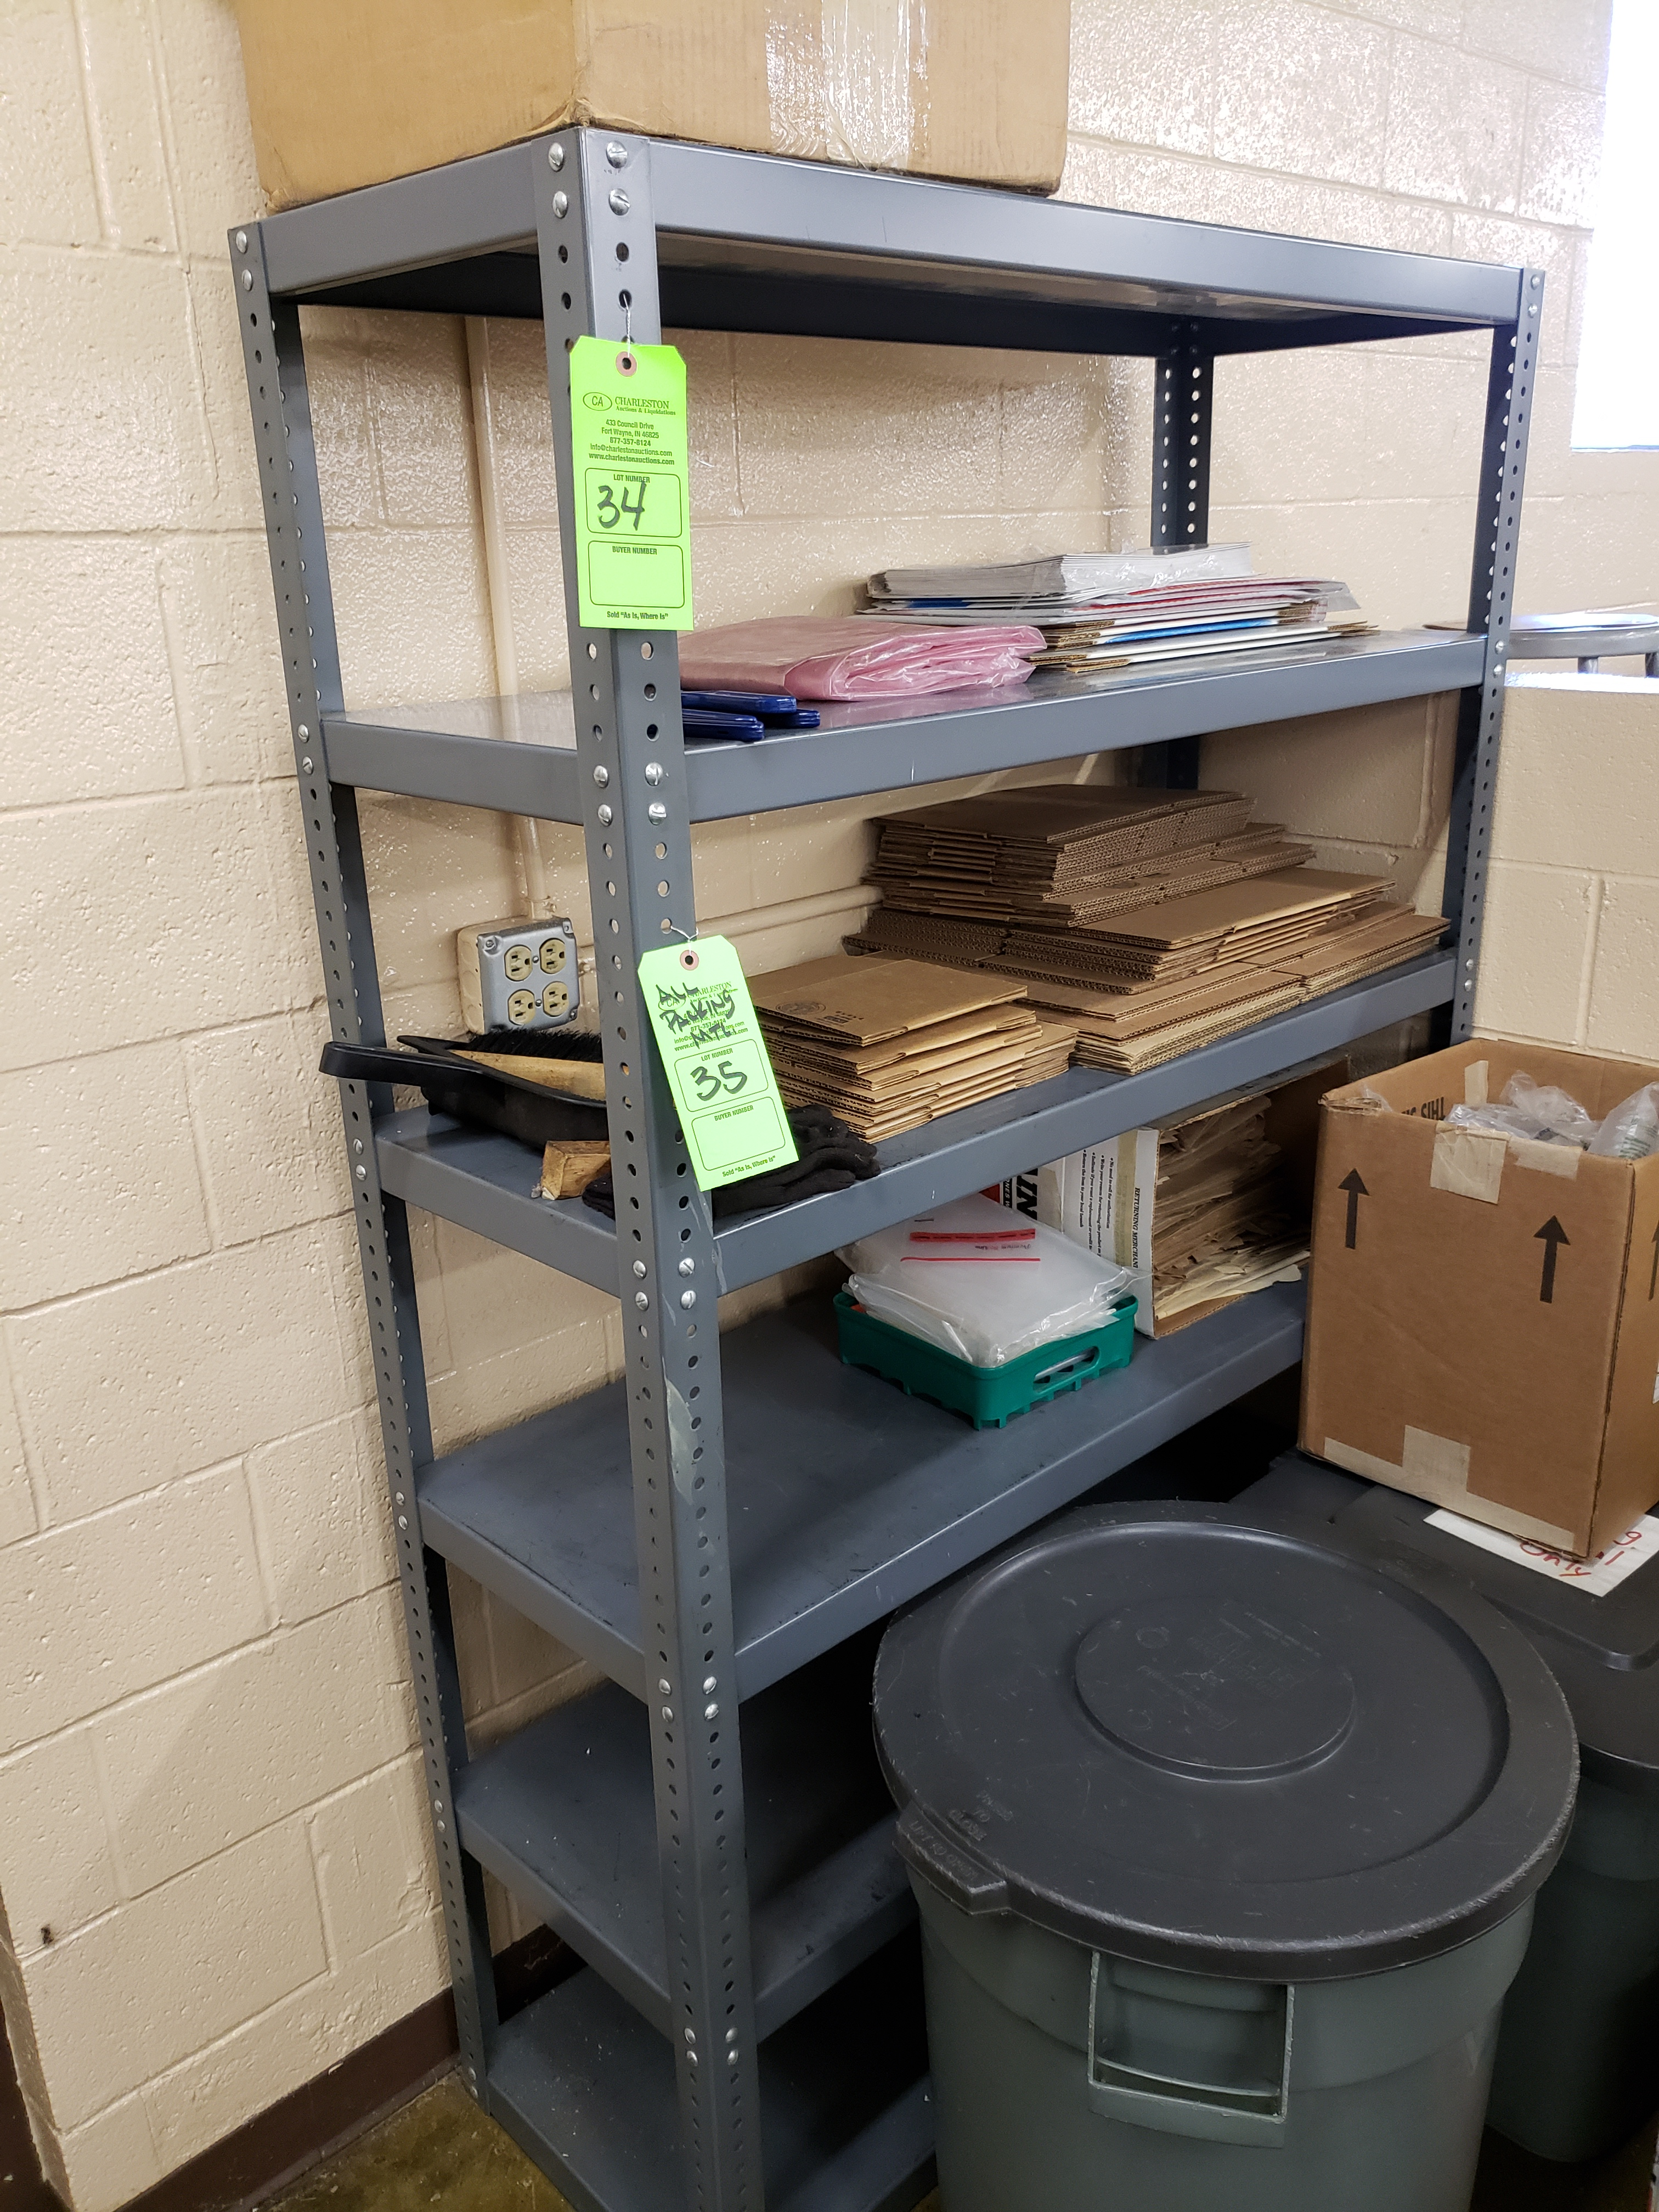 Lot 34 - (1) SECTION PAN SHELVING